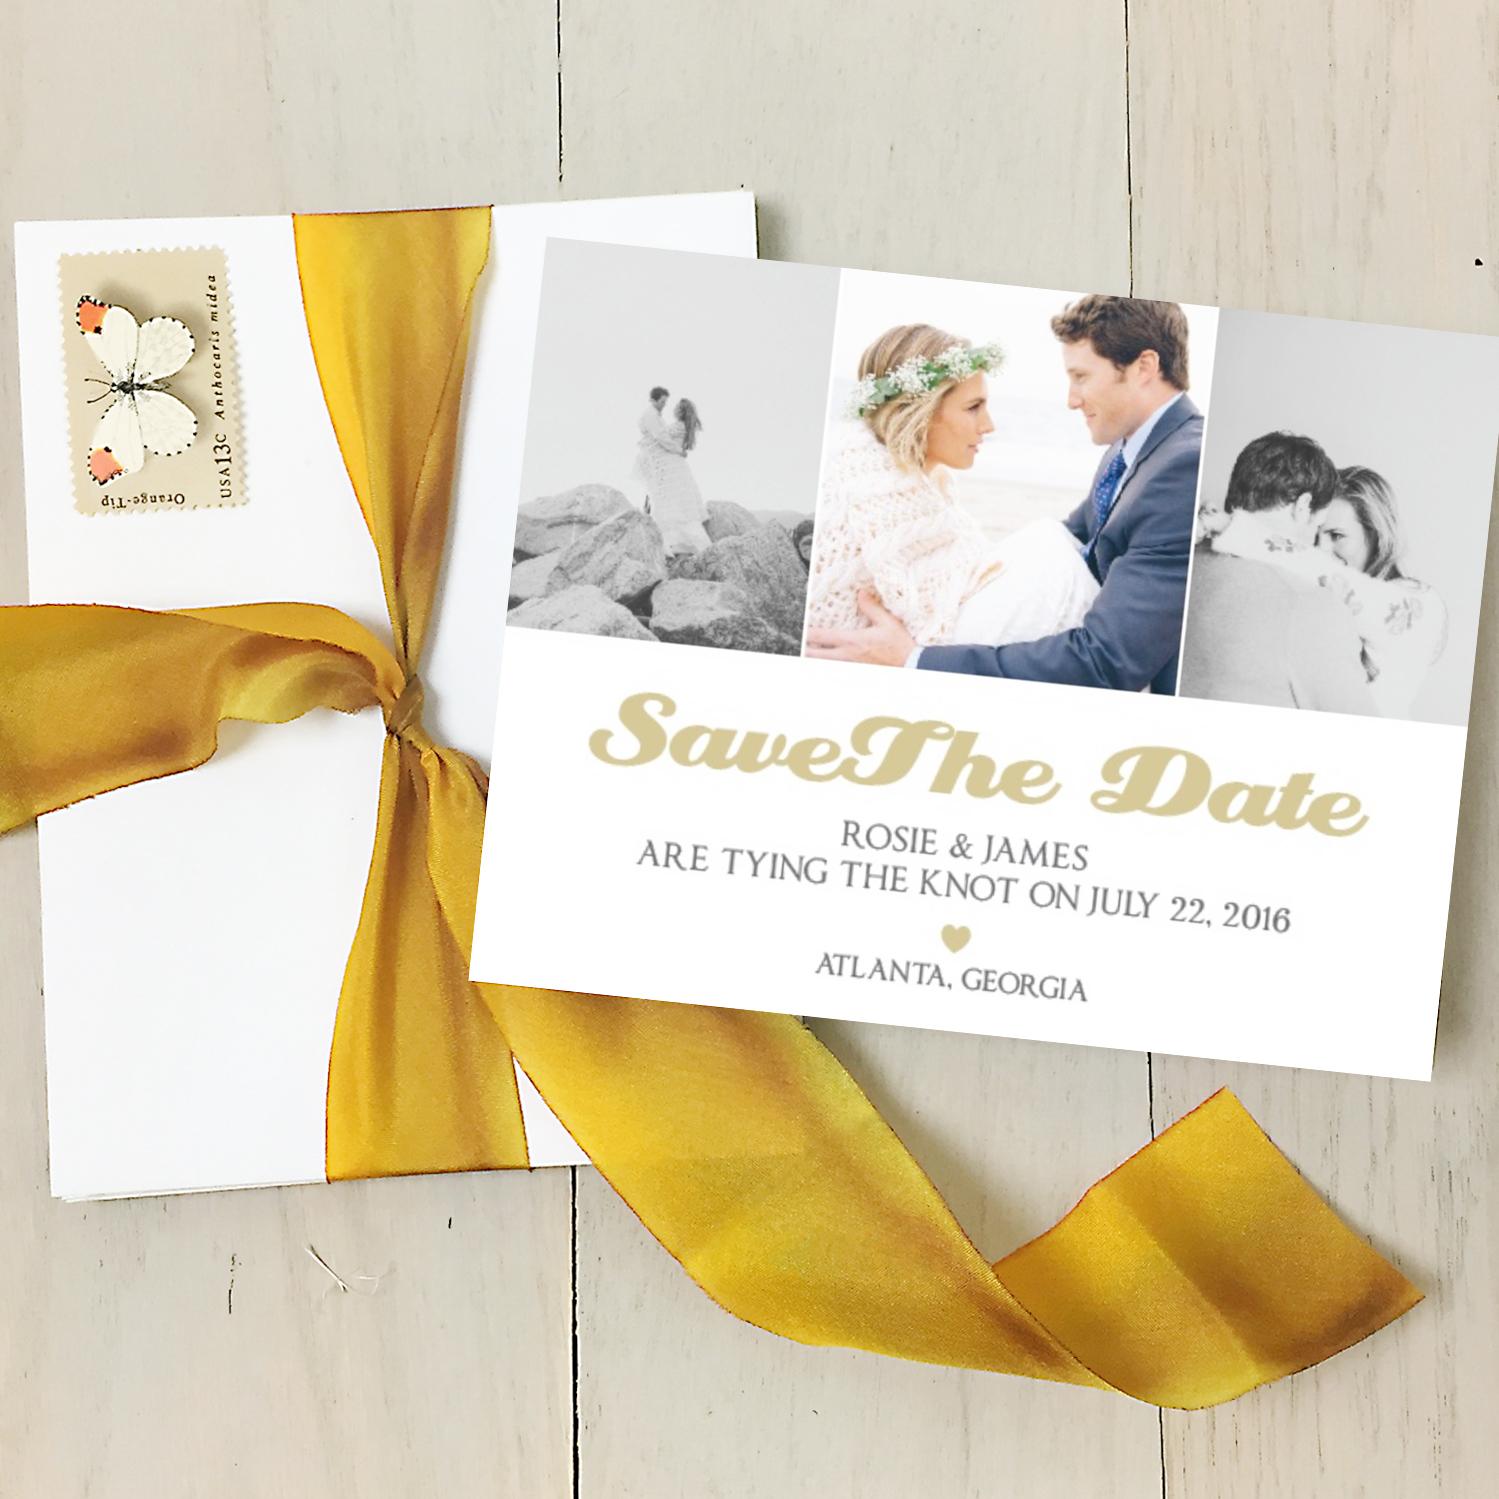 Stylish Wedding Stationery from Basic Invite | The Coordinated Bride